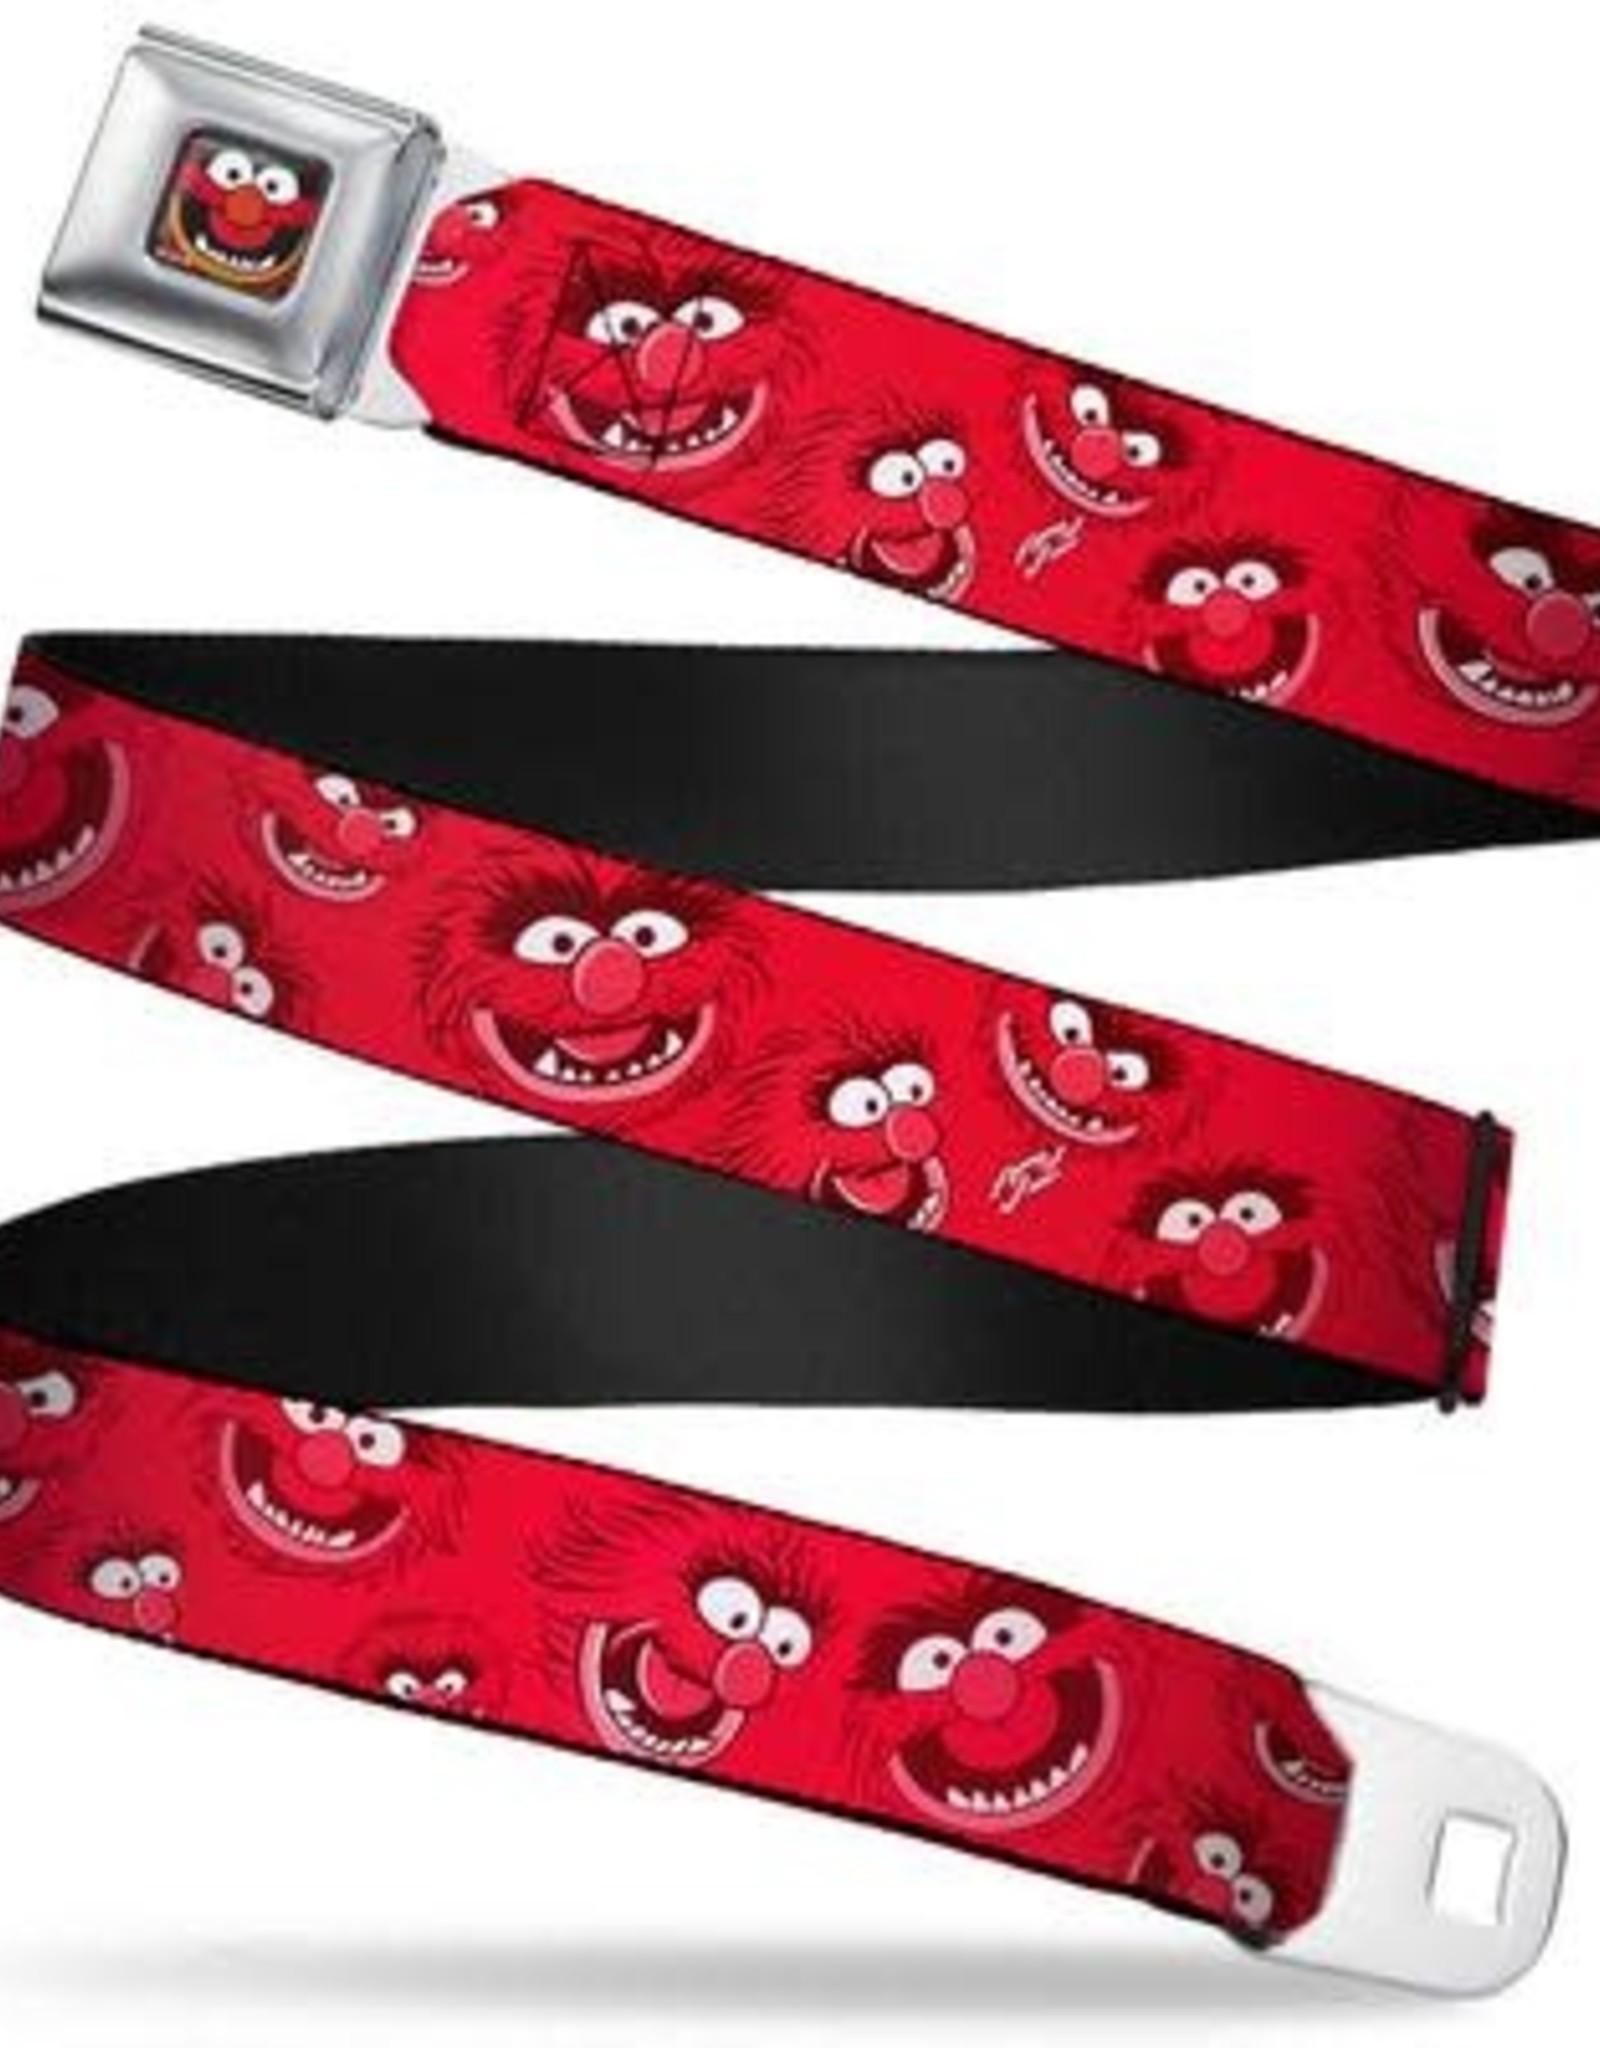 Buckle Down Belts Muppets Animal Face CLOSE-UP Full Color Black Seatbelt Belt - Animal Expressions Scattered Reds Webbing